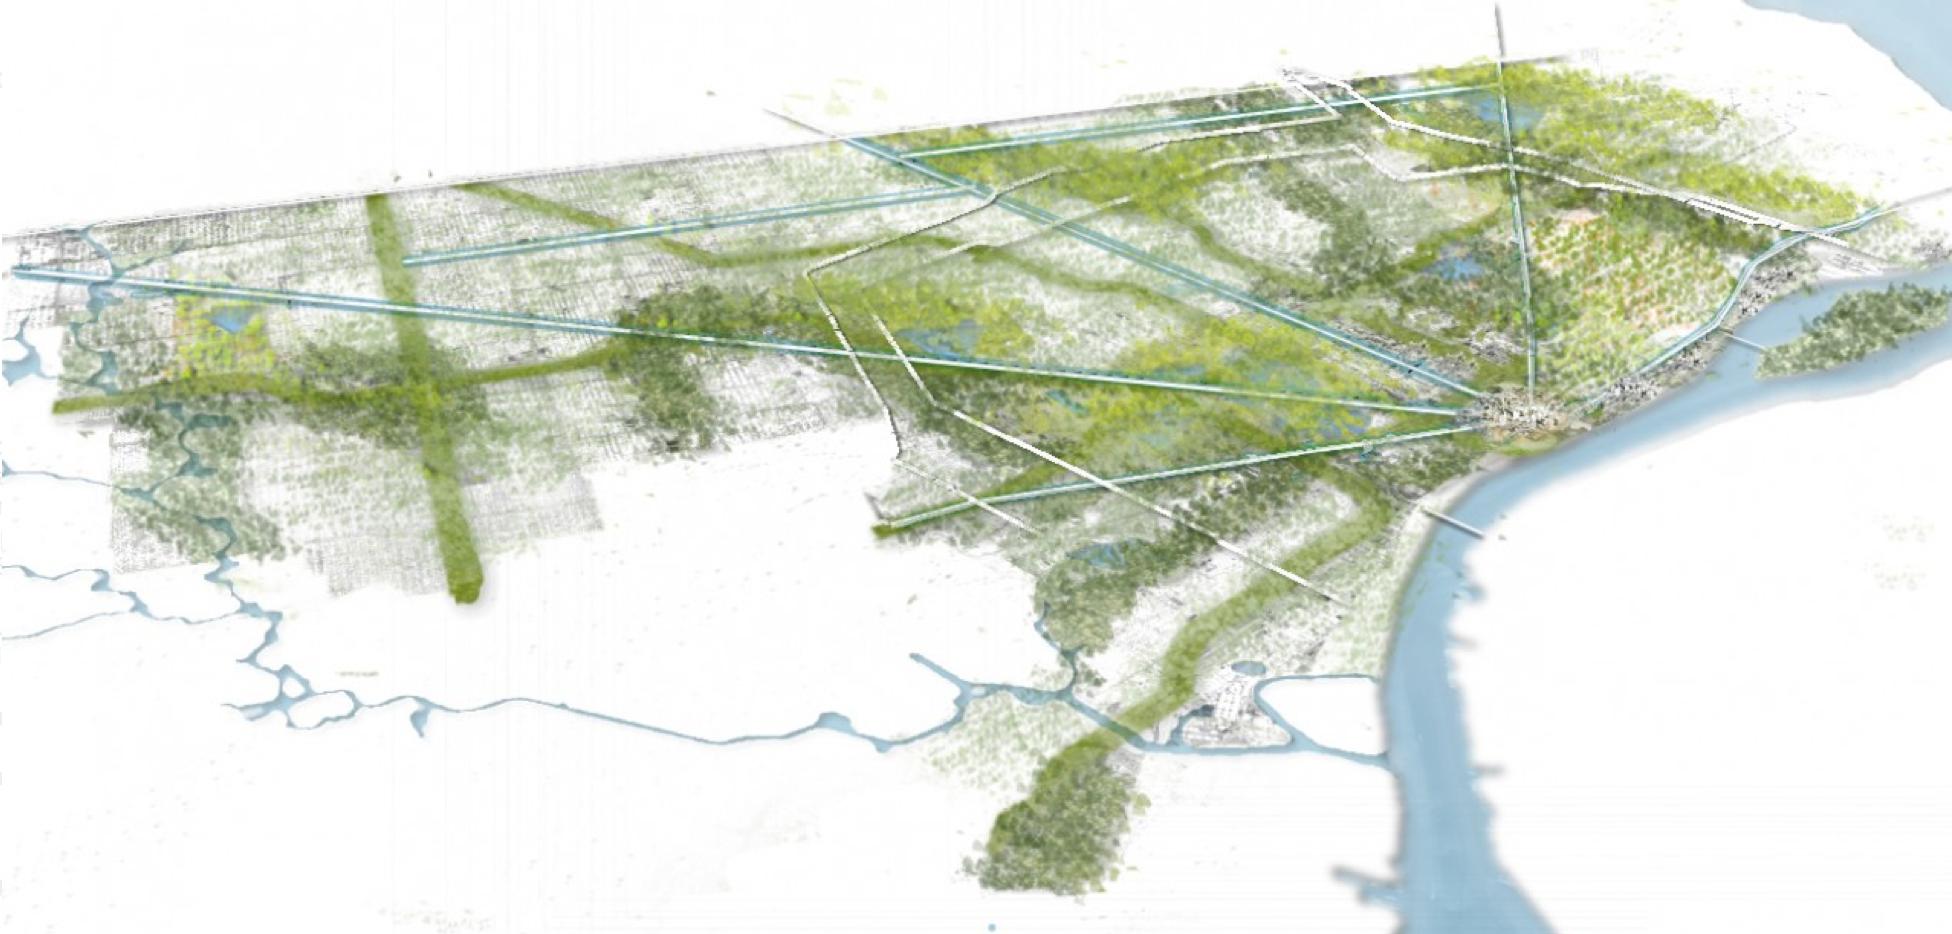 Image: Stoss Landscape Urbanism